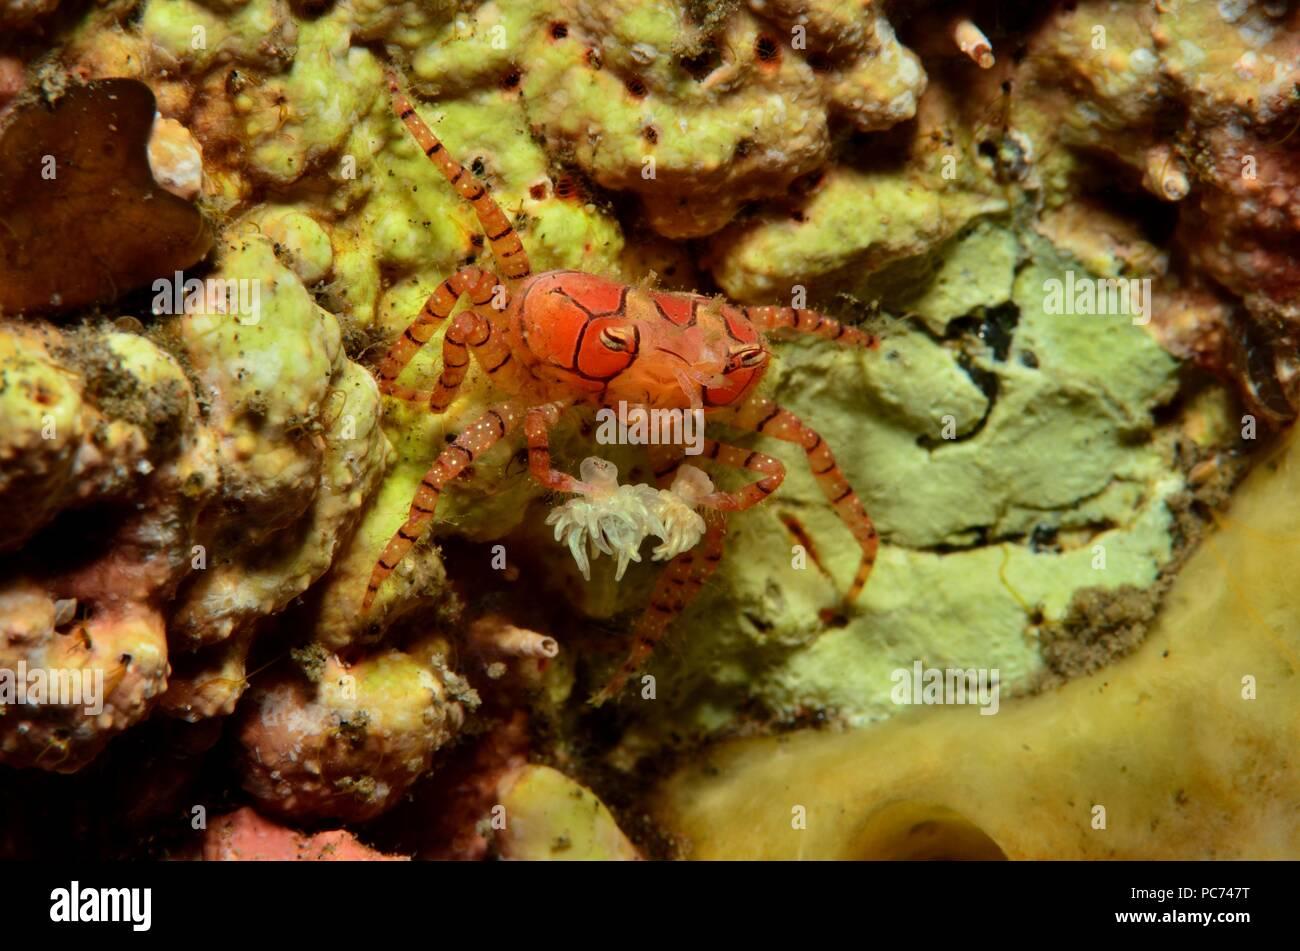 boxer or pom pom crab, Boxer-Krabbe, Lybia tesselata - Stock Image